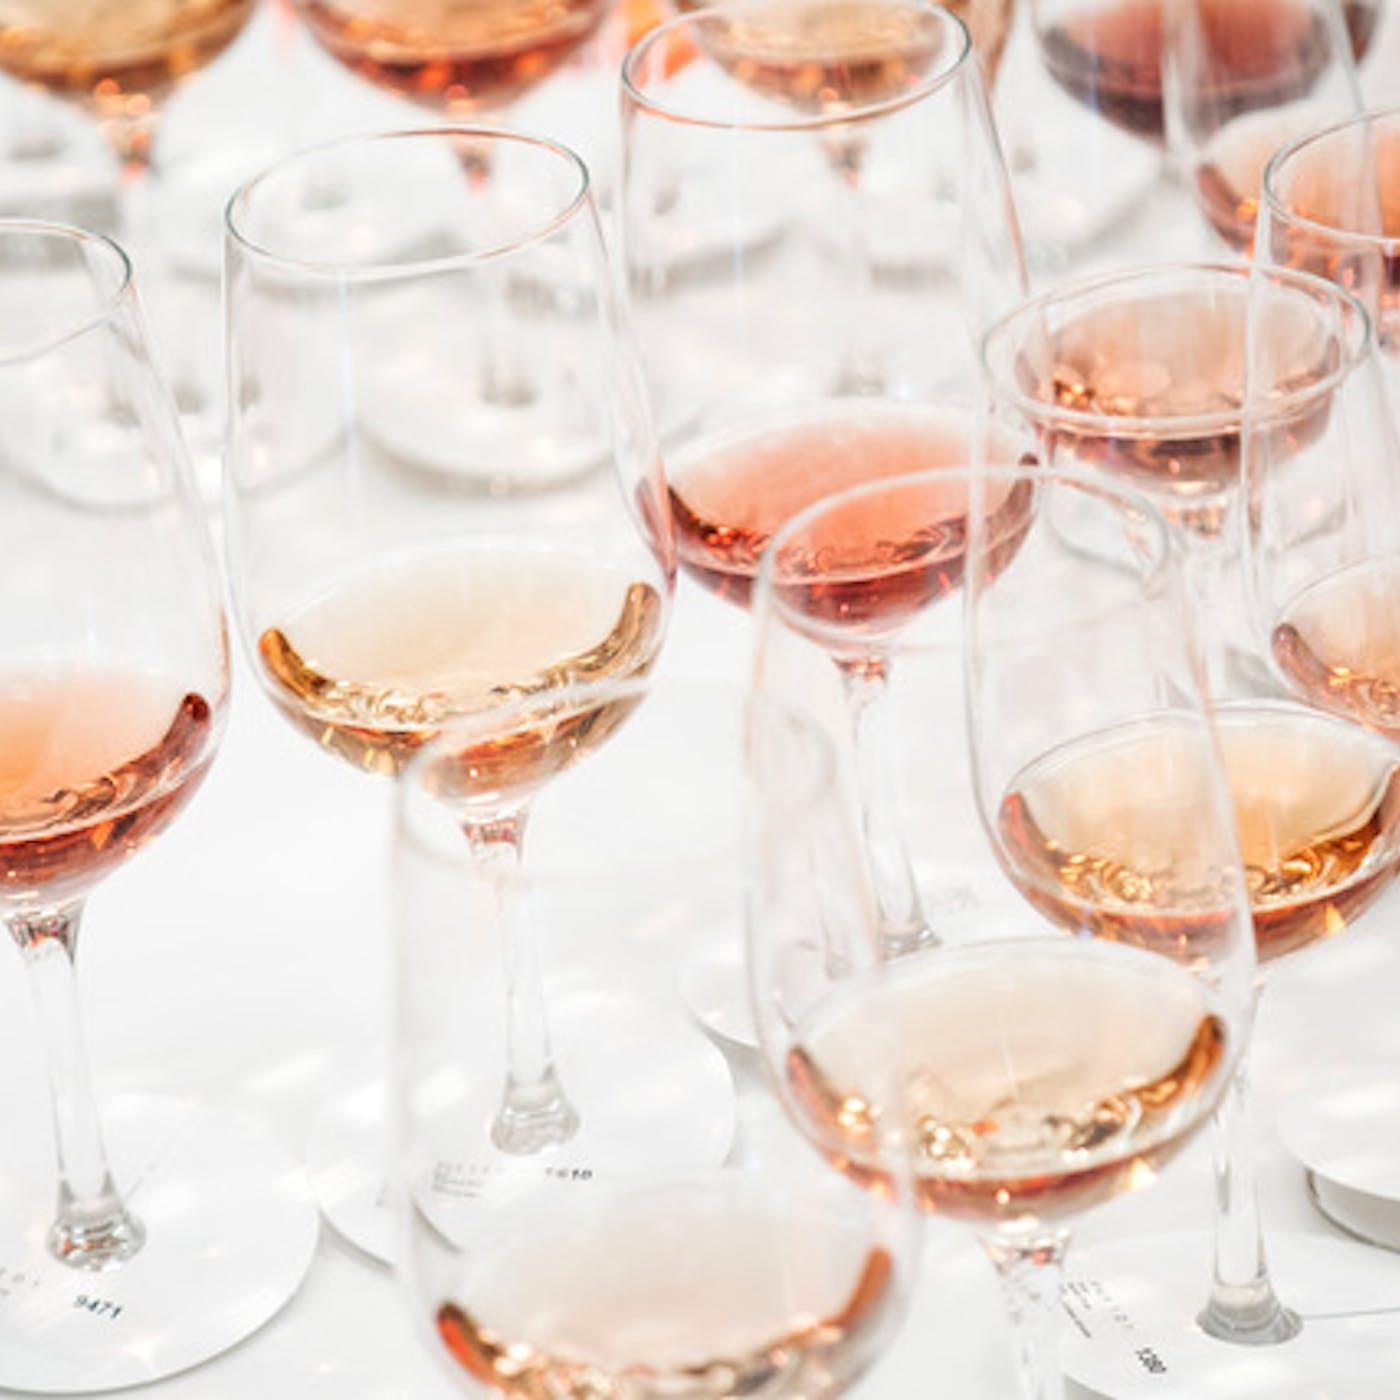 Mazzo Di Fiori E Spumante.Texsom International Wine Awards 2018 Texas Monthly